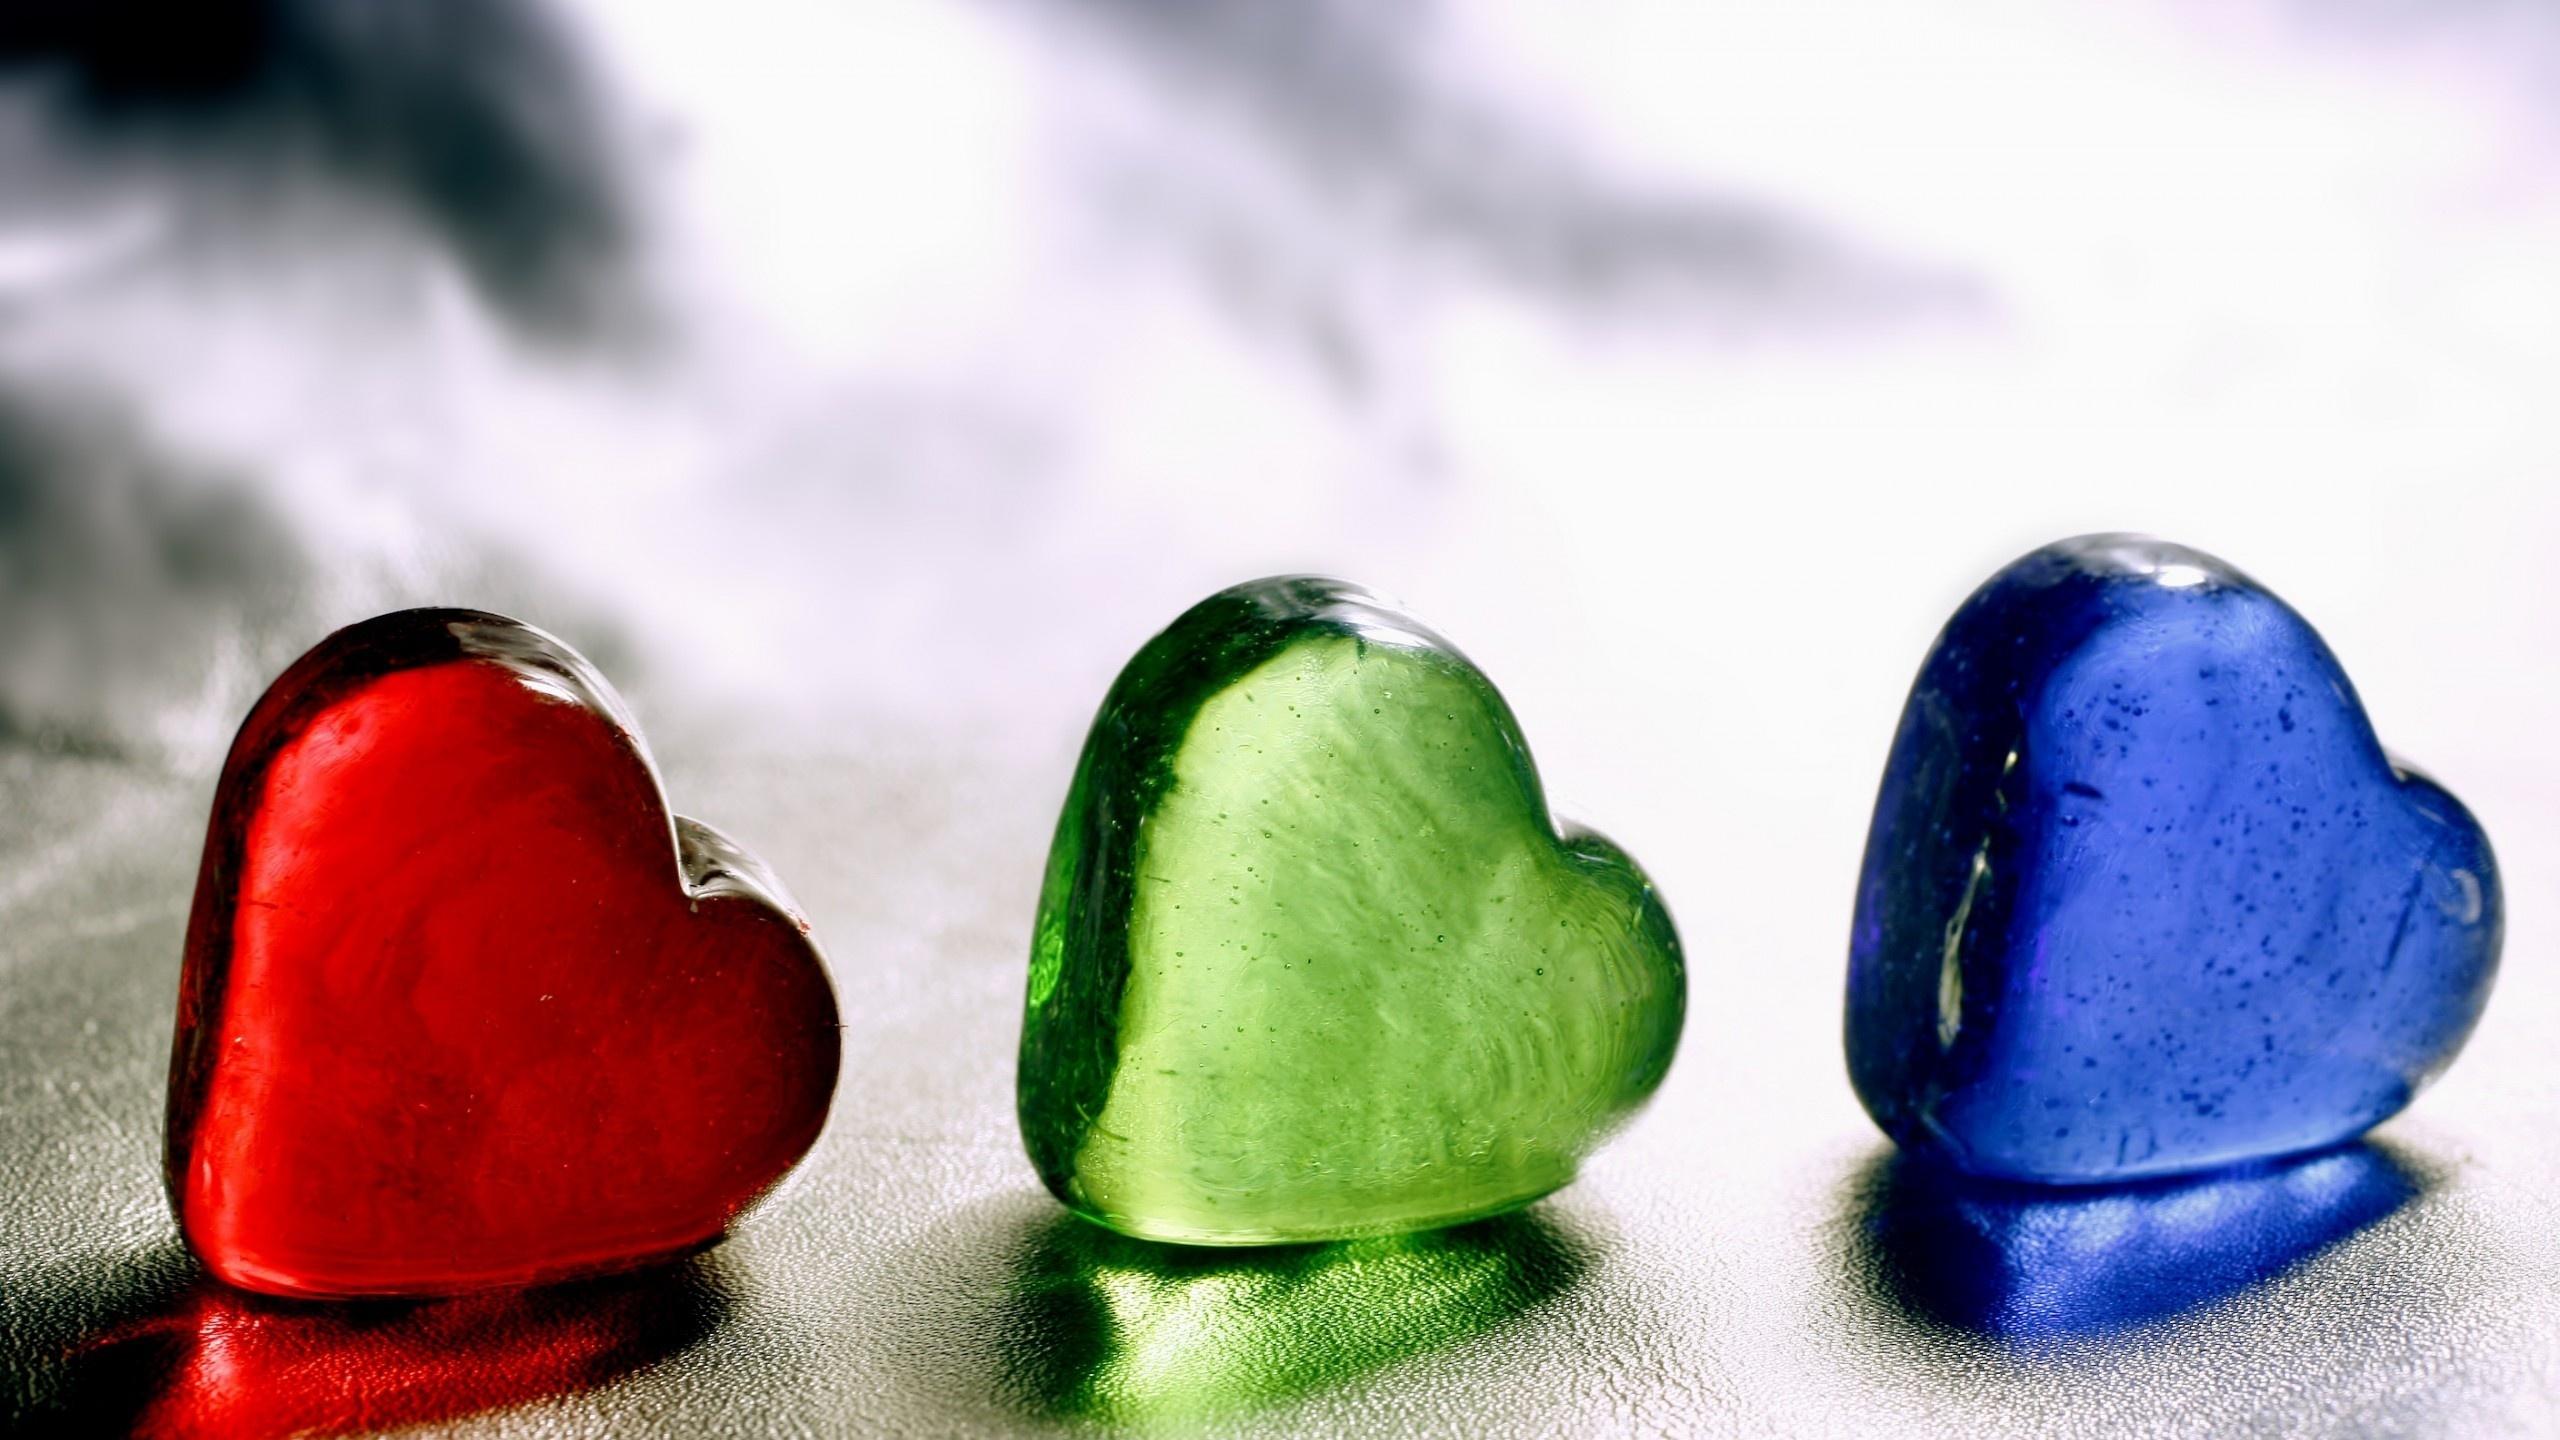 Сердце из камушка  № 1609190 без смс